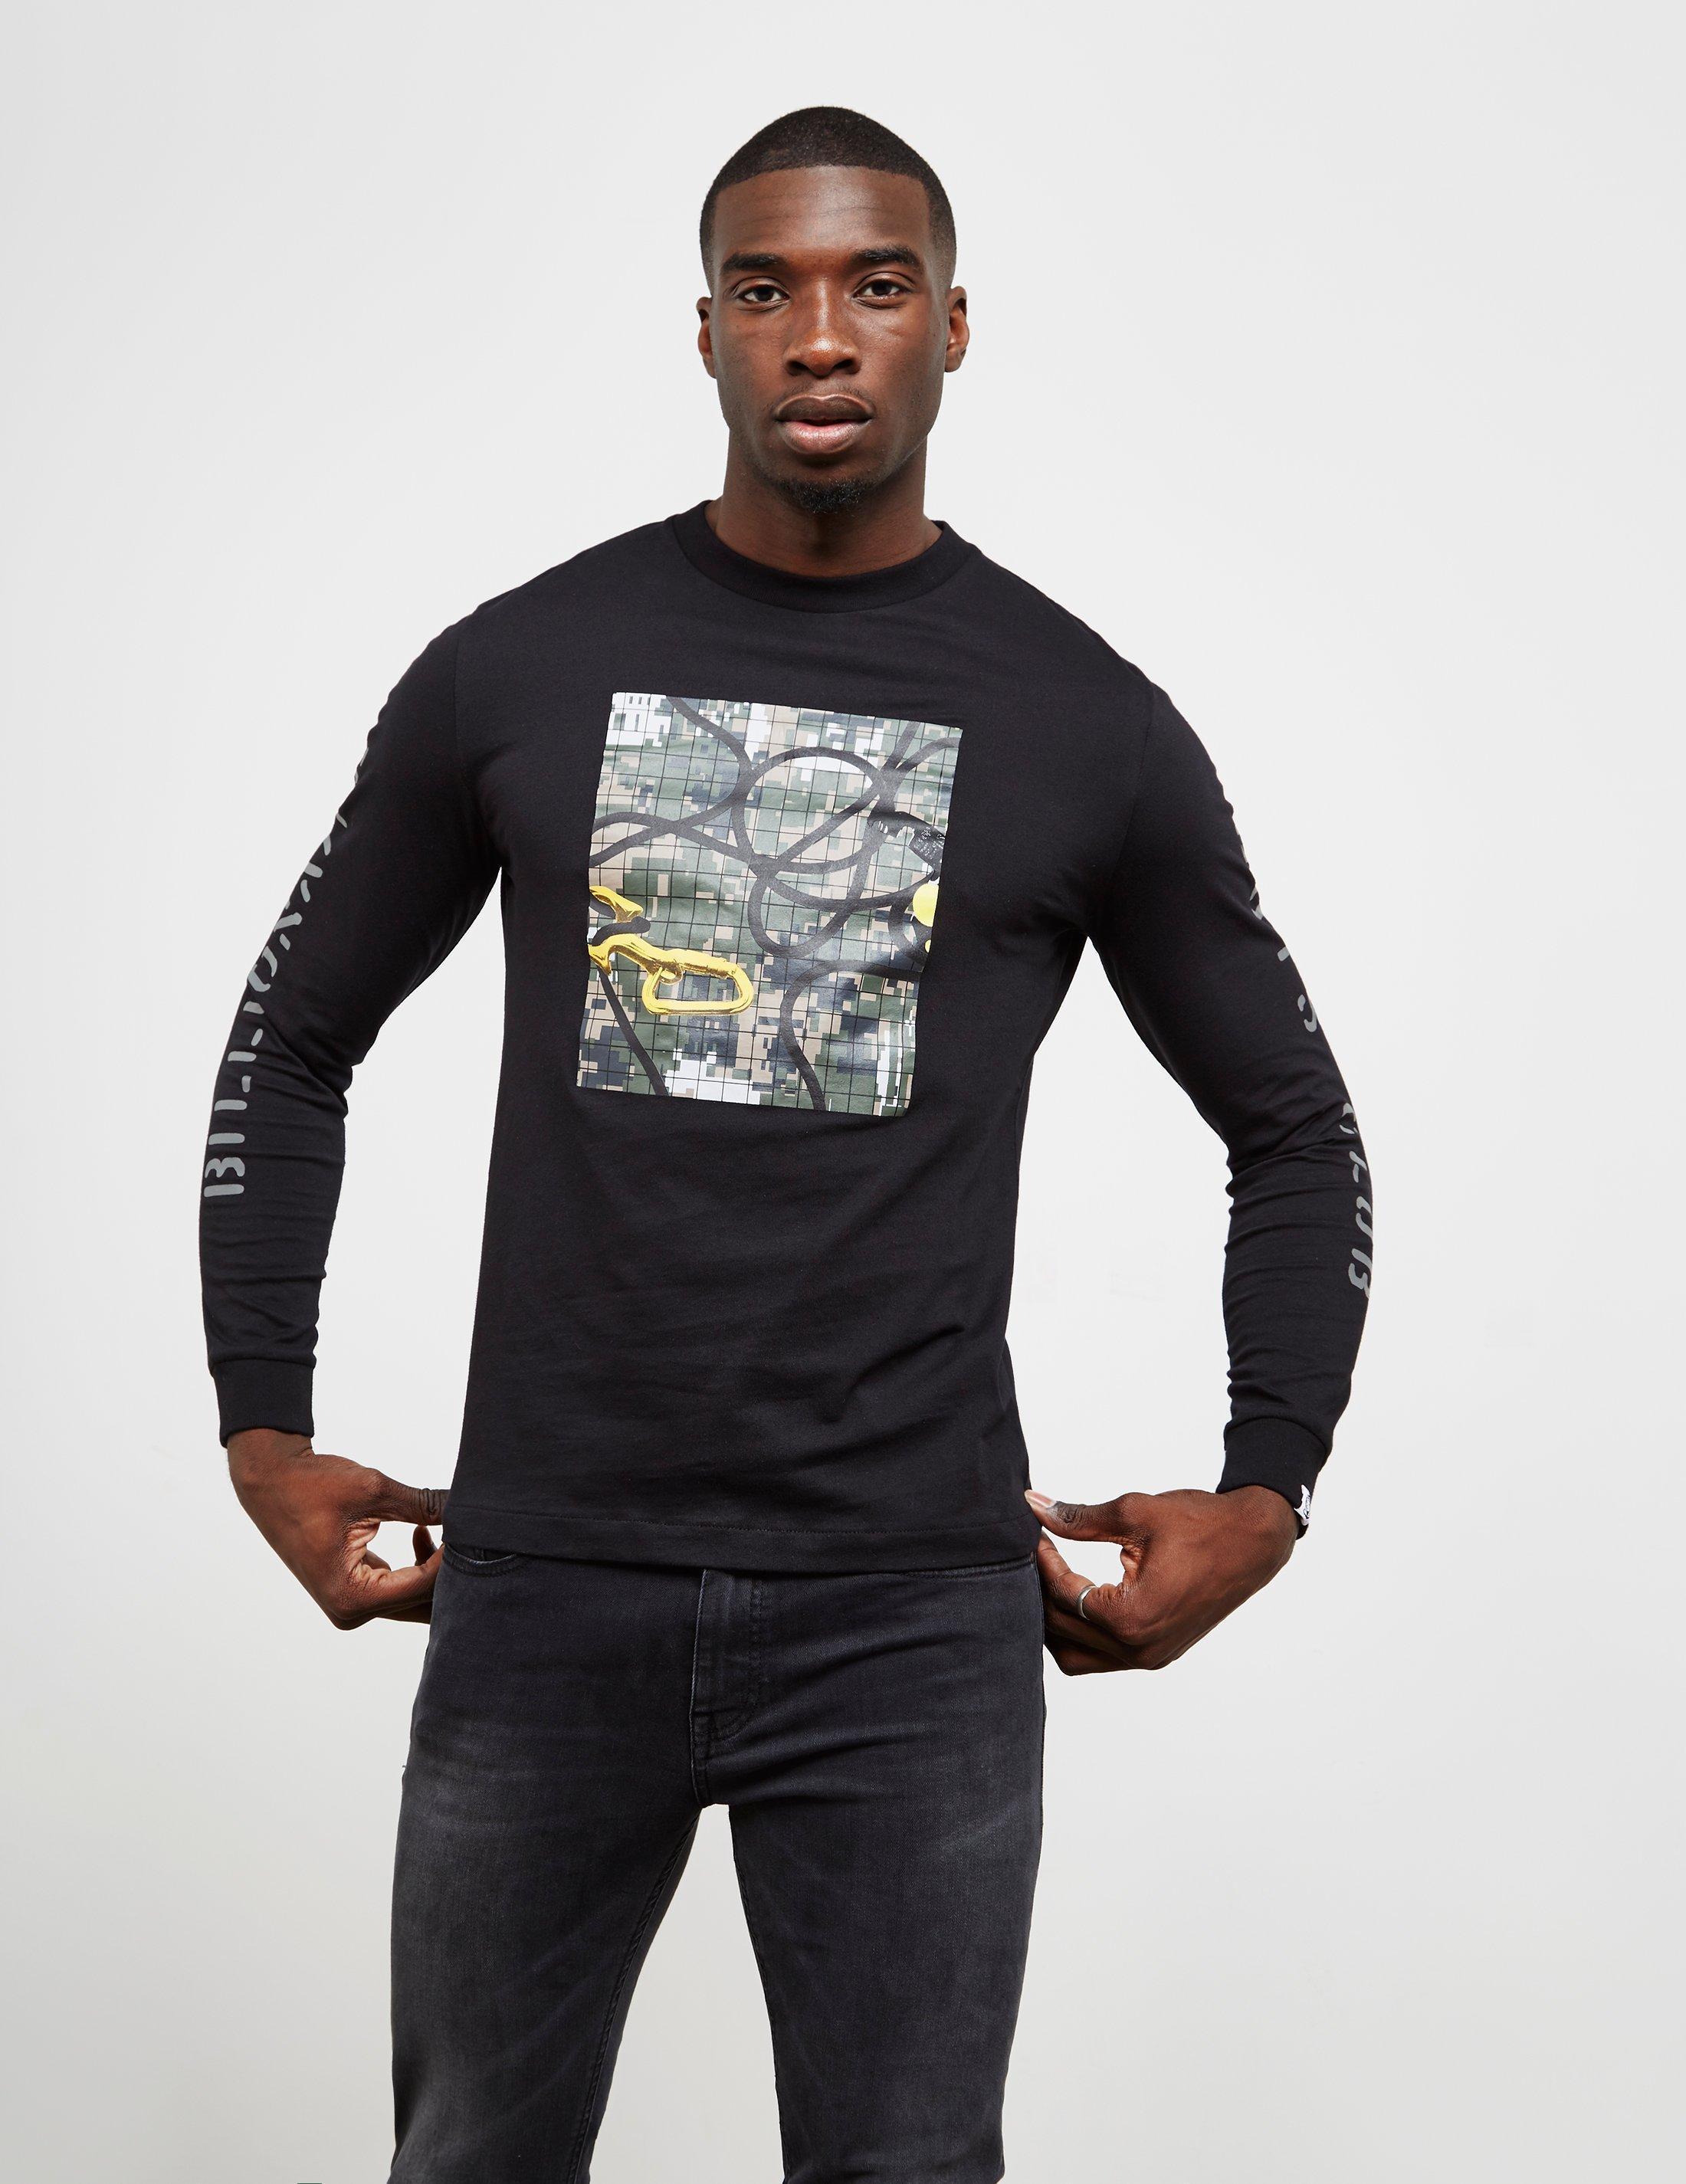 740bfeae83 Lyst - Bbcicecream Mens Camouflage Square Long Sleeve T-shirt Black ...